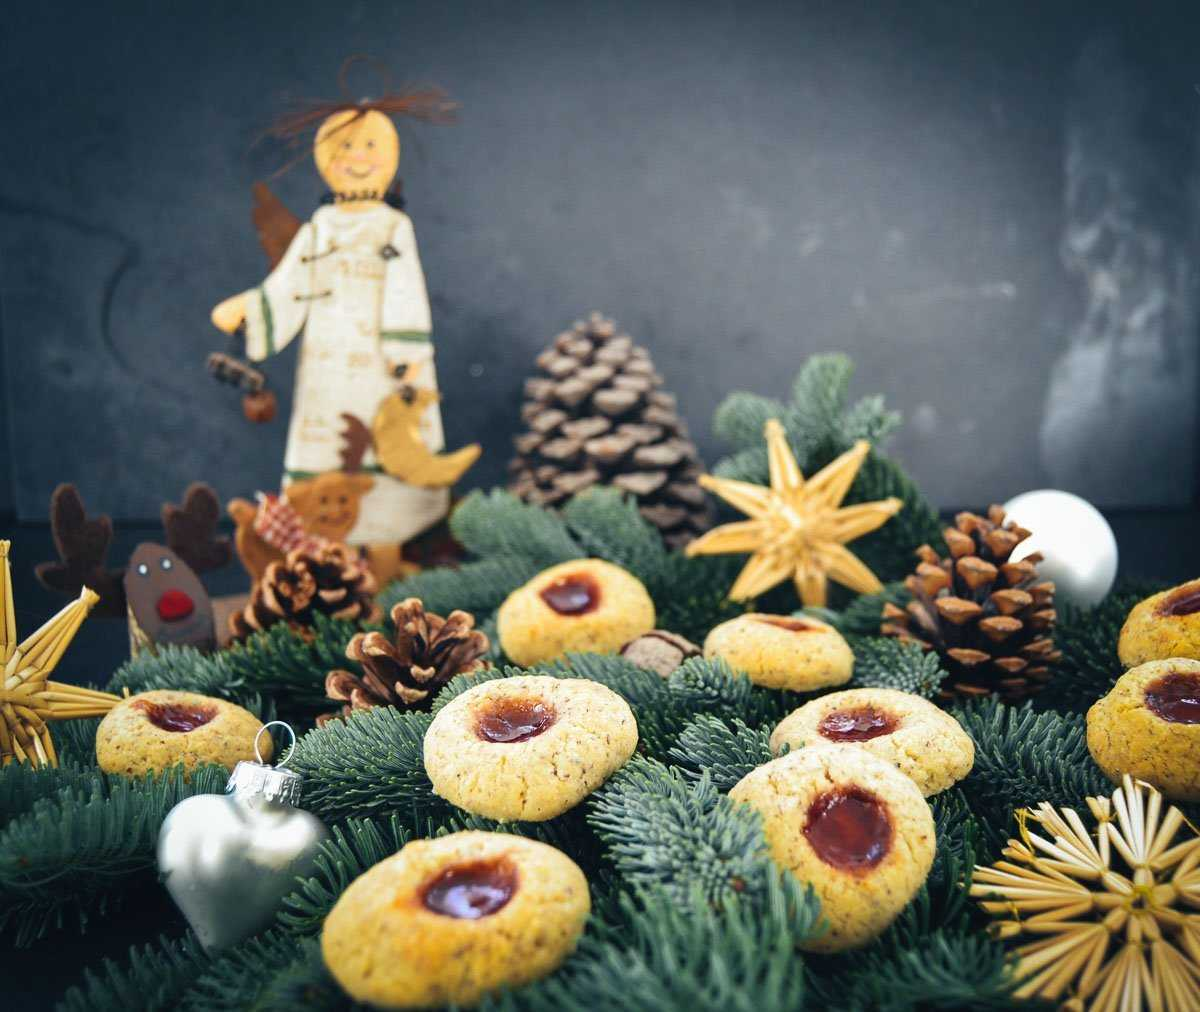 Husarenkrapfen Omas Weihnachtsplätzchen Rezept